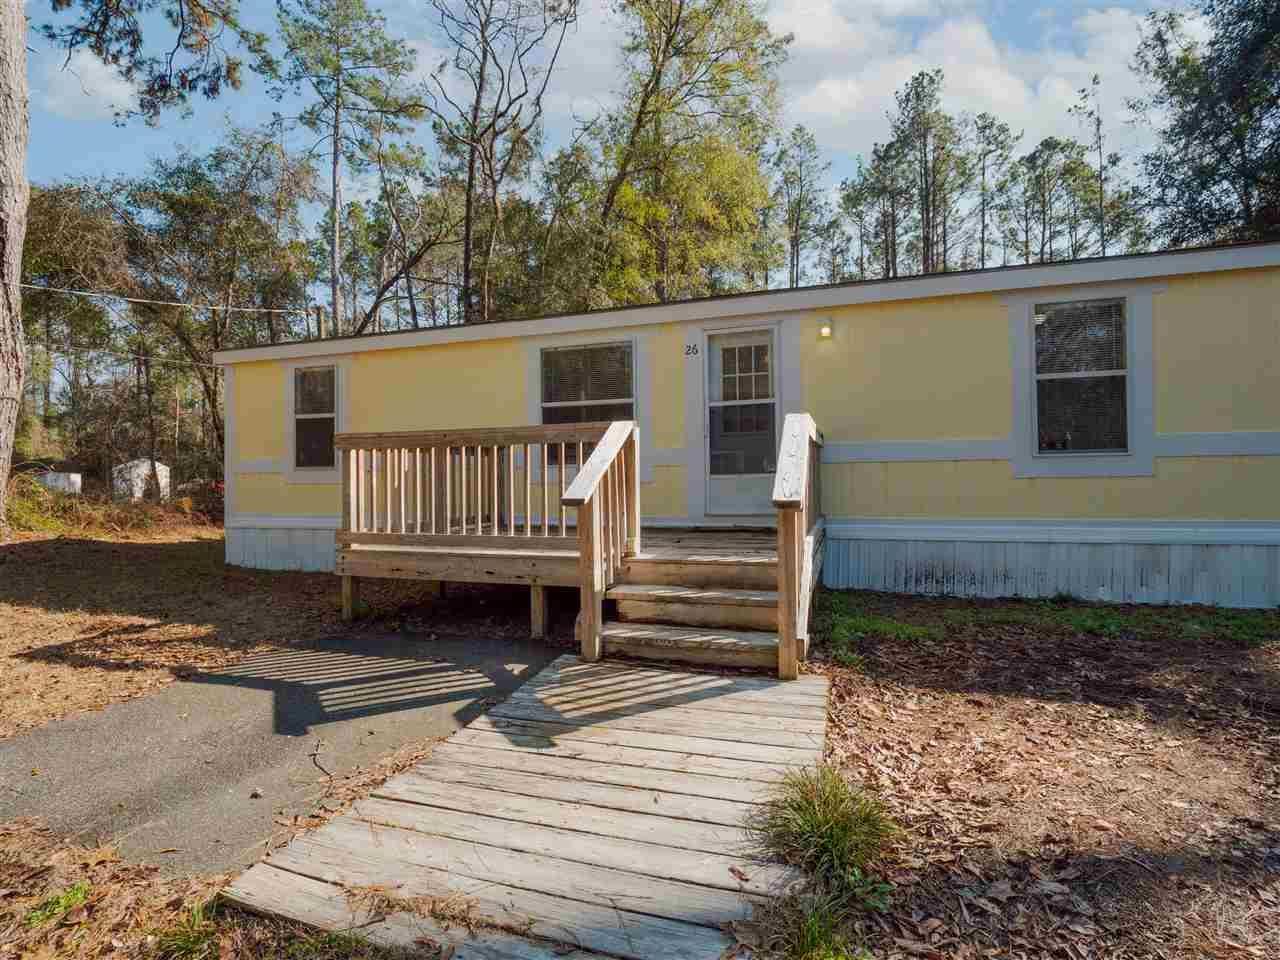 26 American Way, Crawfordville, FL 32327 - MLS#: 328807